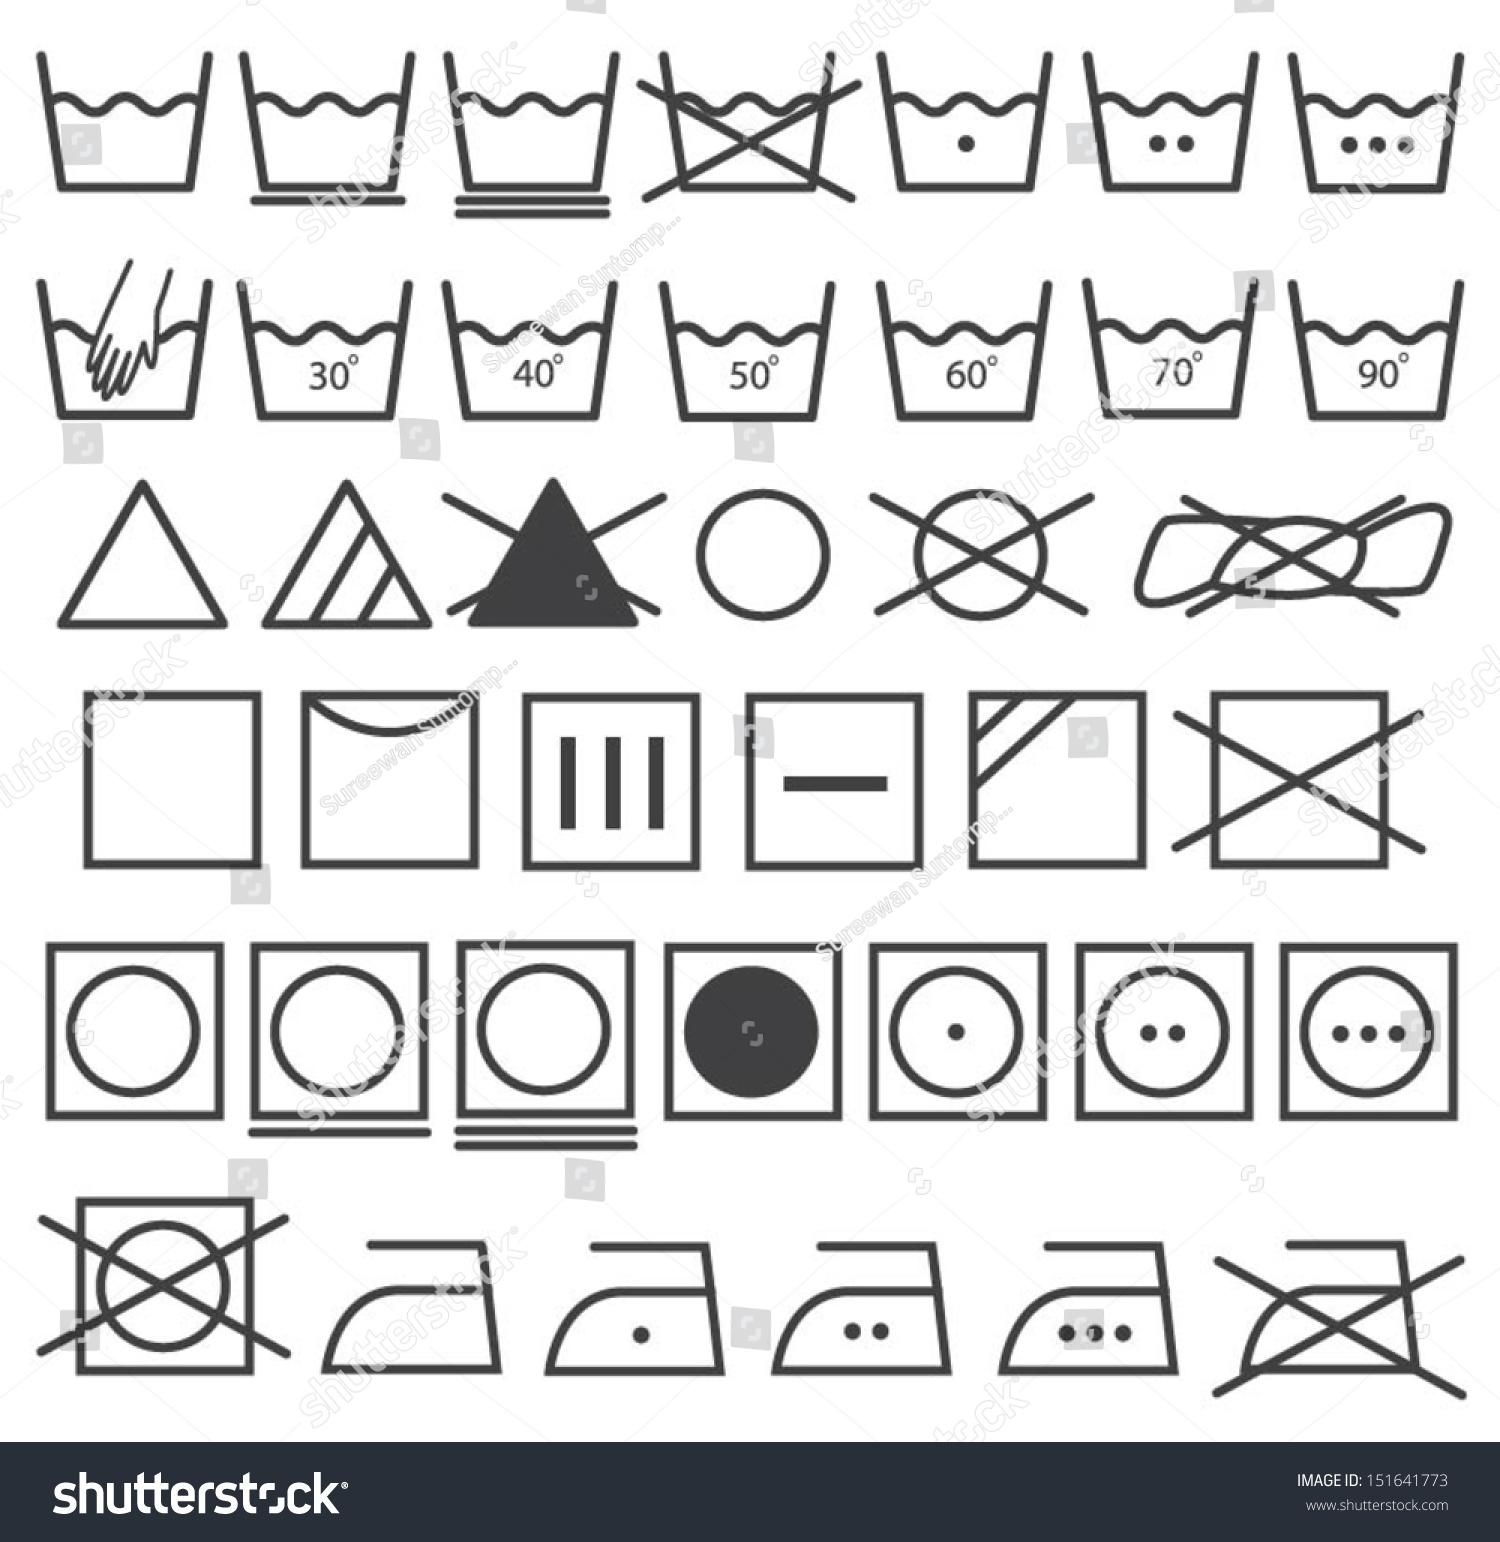 Laundry icons vector set washing symbol stock vector 151641773 laundry icons vector set washing symbol buycottarizona Gallery